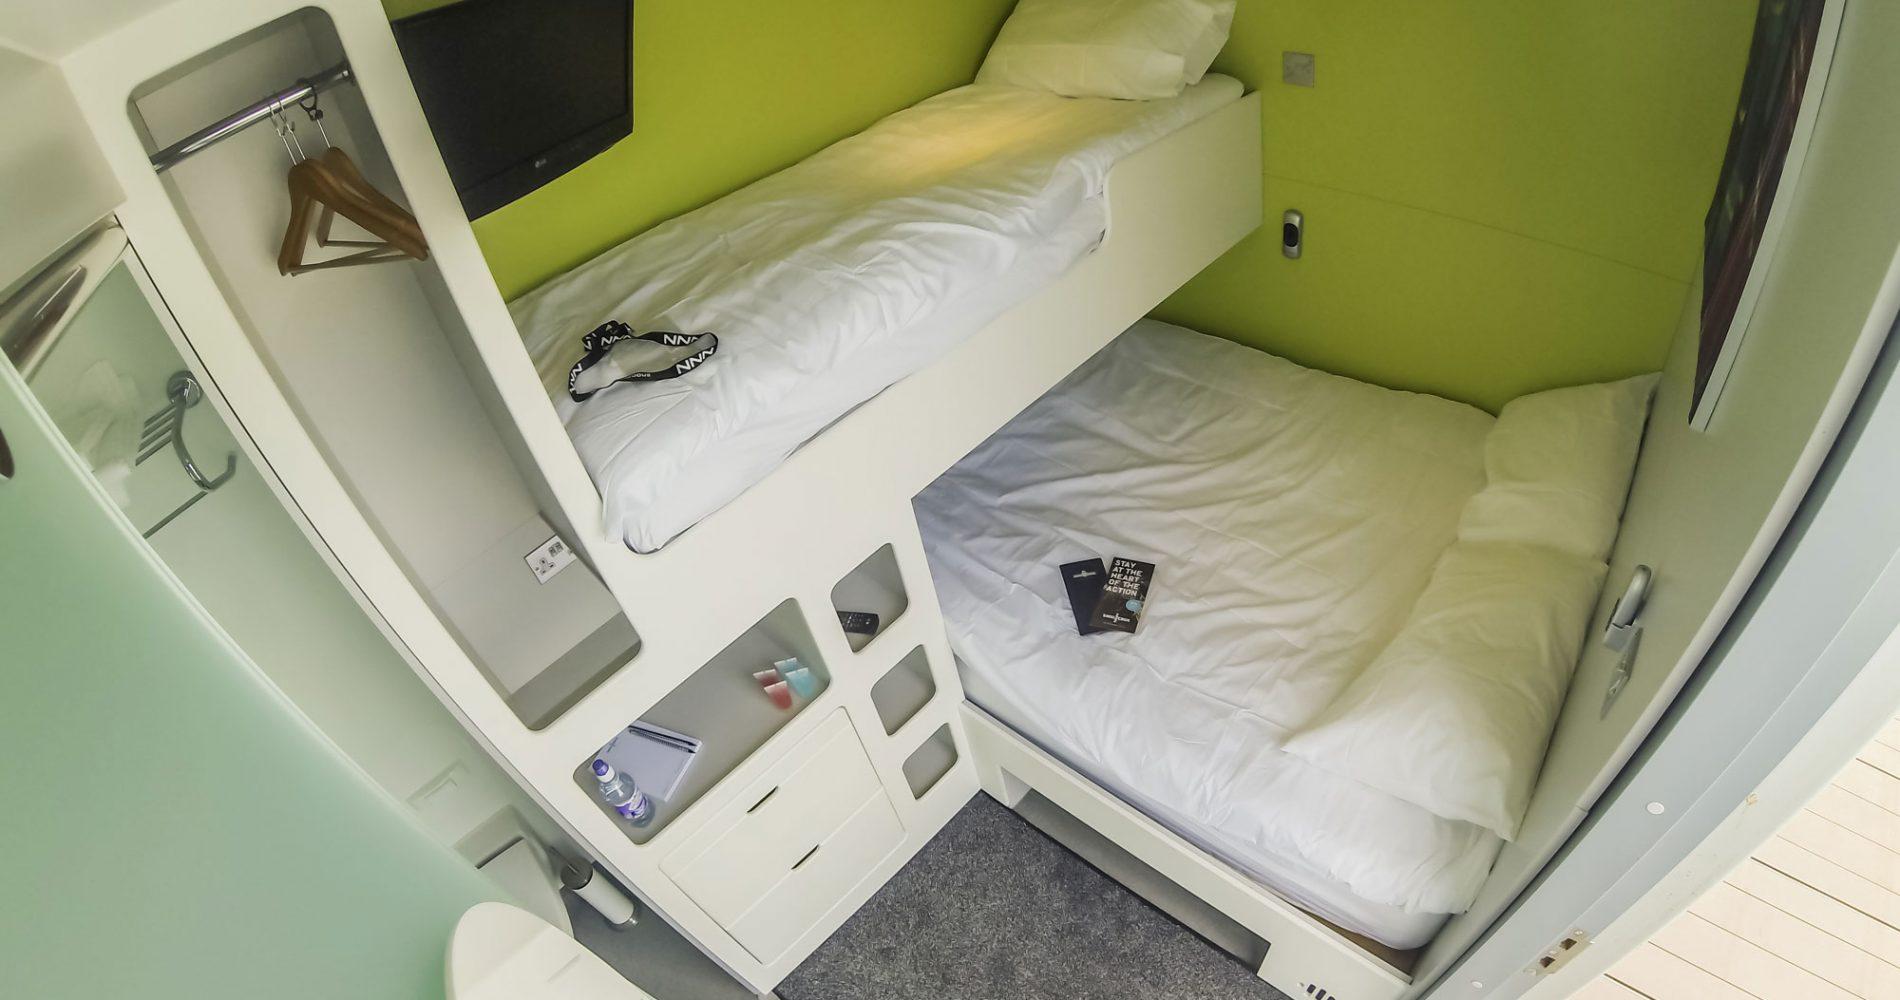 Snoozebox inside